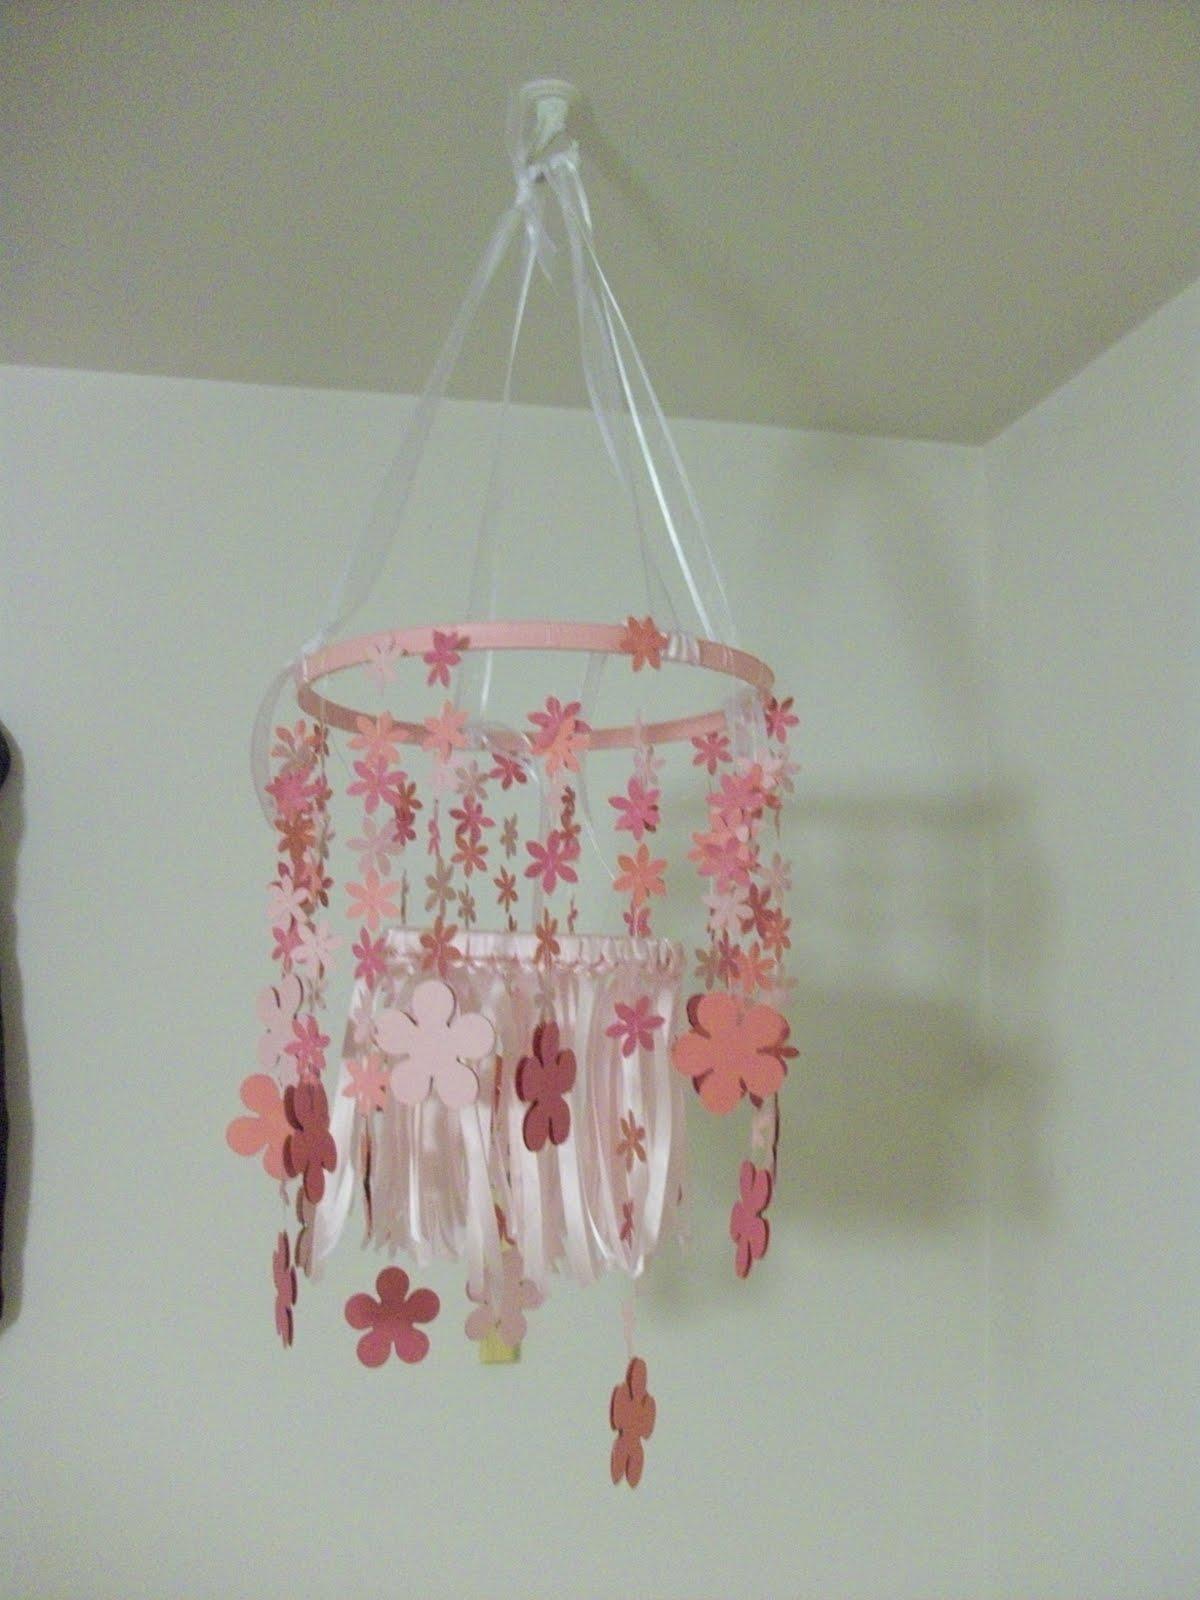 Ordinary magic diy flower chandelier diy flower chandelier arubaitofo Image collections